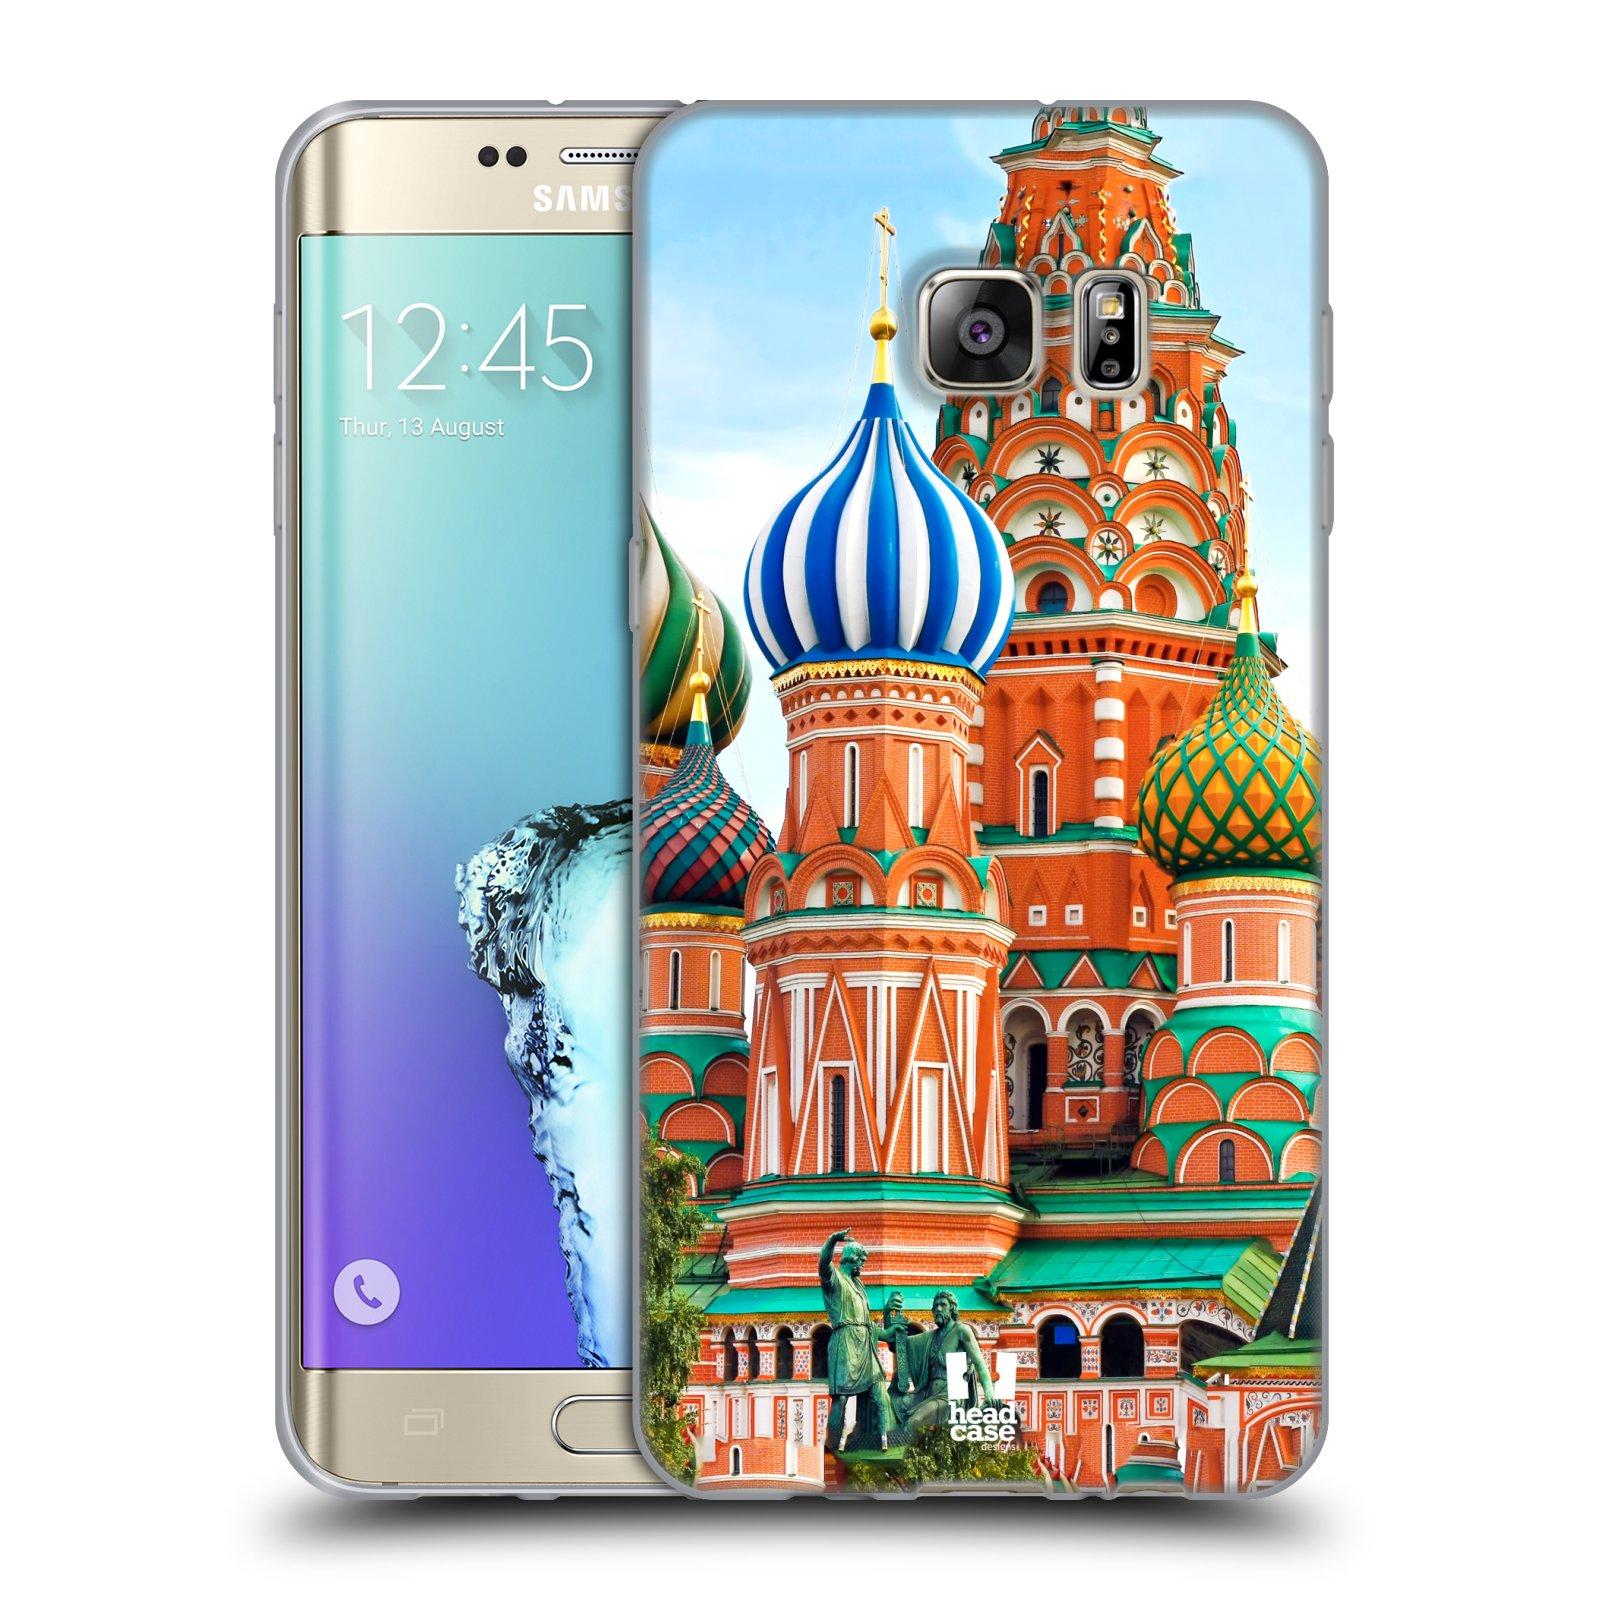 HEAD CASE silikonový obal na mobil Samsung Galaxy S6 EDGE PLUS vzor Města foto náměstí RUSKO,MOSKVA, RUDÉ NÁMĚSTÍ